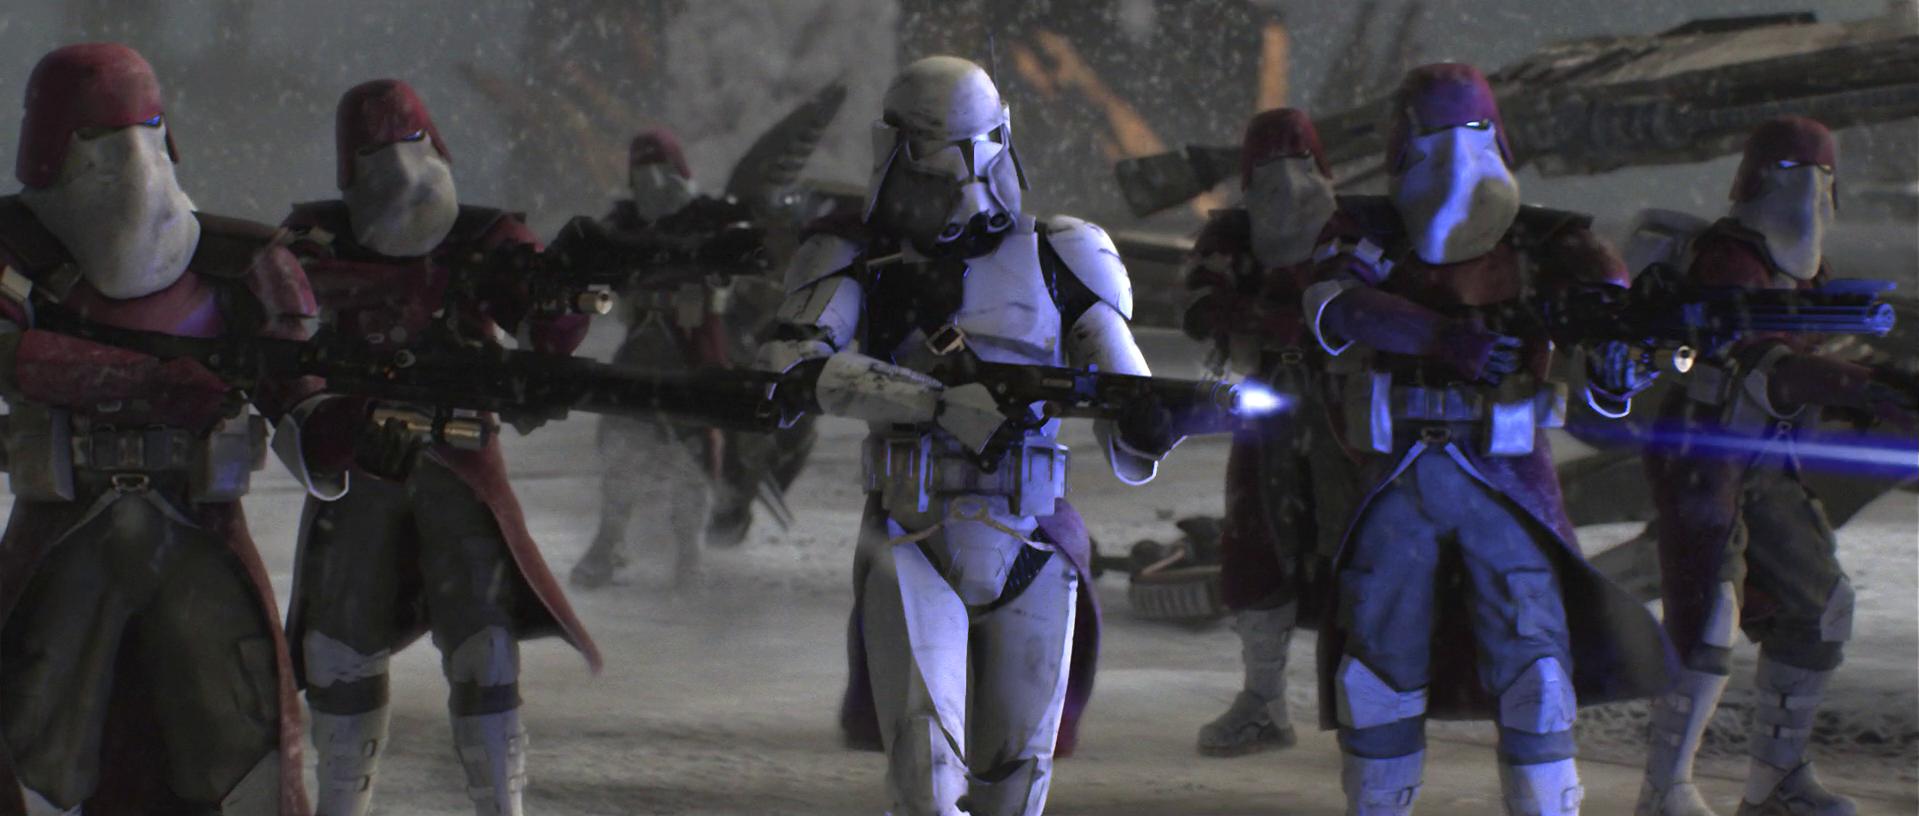 Lego Star Wars Galatic Marine ARC Commander Zero Clone Wars